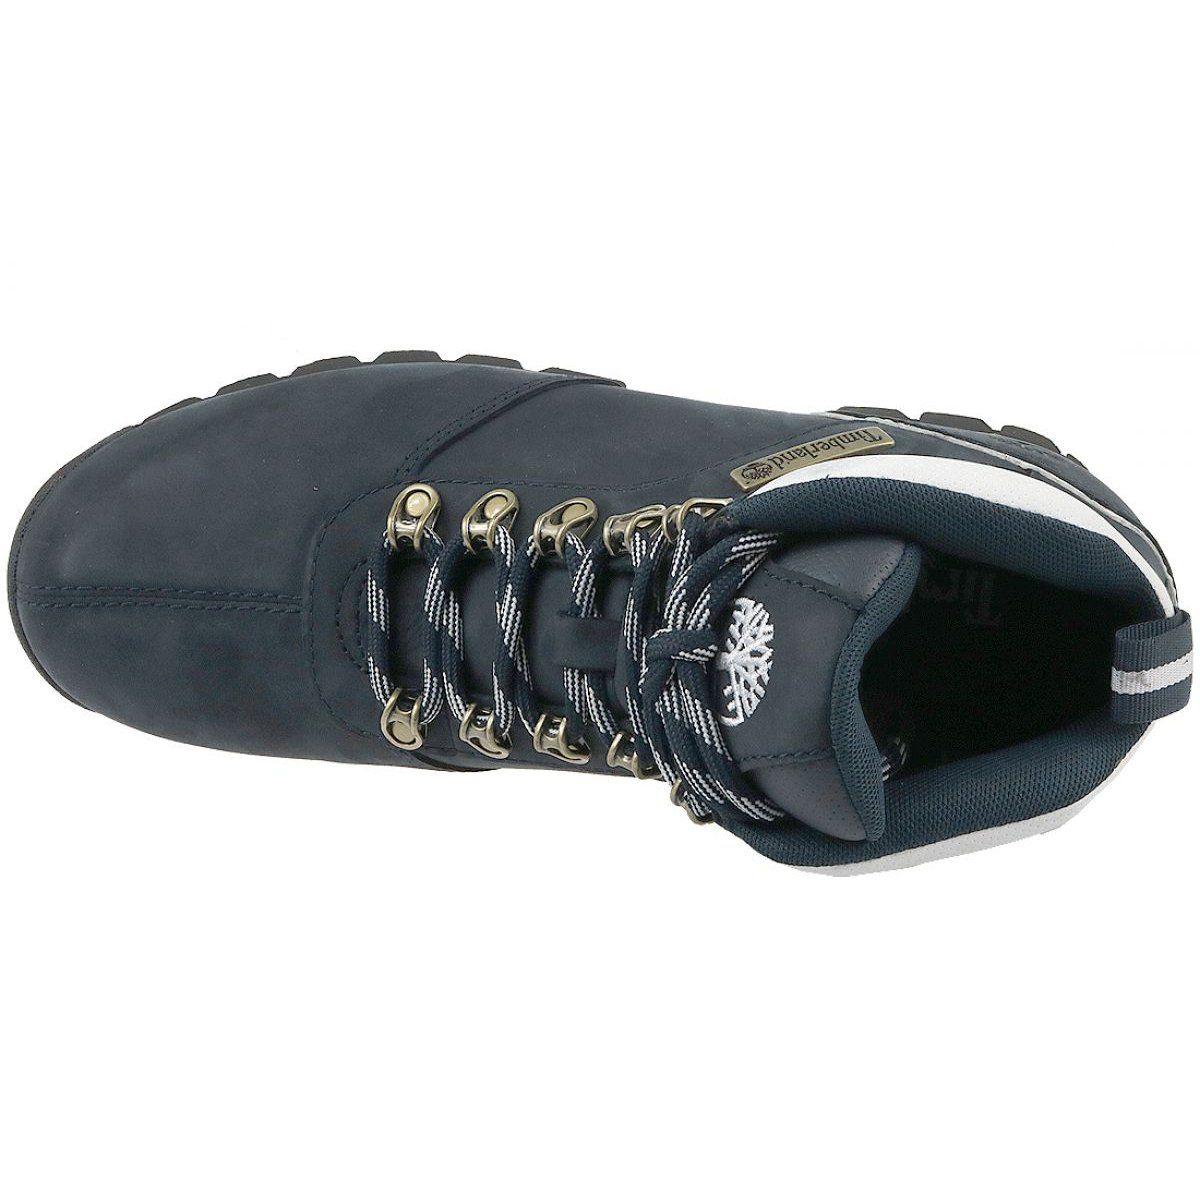 Buty Zimowe Timberland Split Rock 2 M 6569r Granatowe Winter Boots Boots Sport Shoes Men